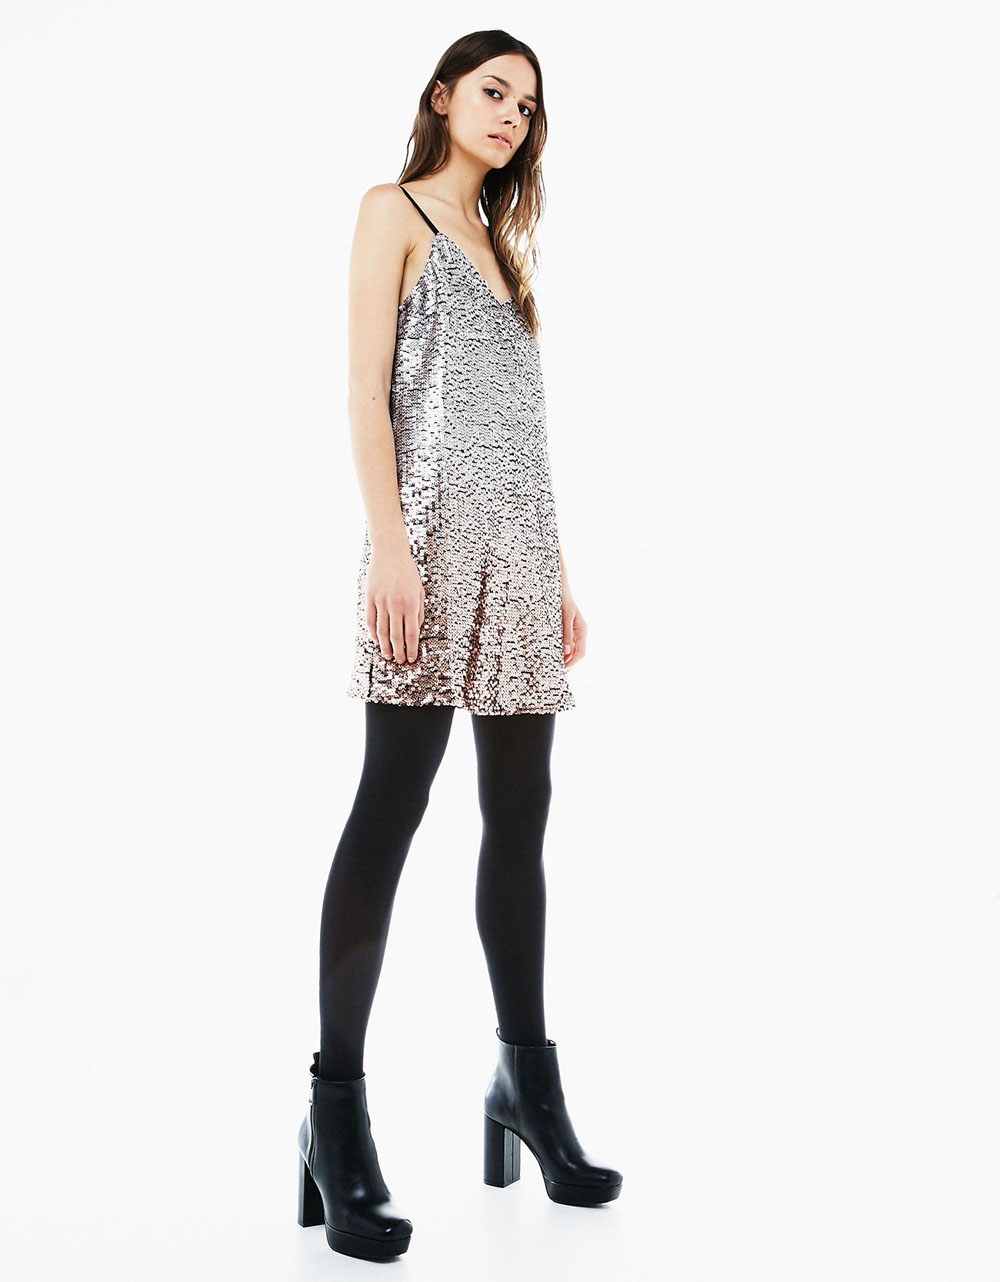 Srebrna šljokičasta haljina (Bershka, 249,90 kn)